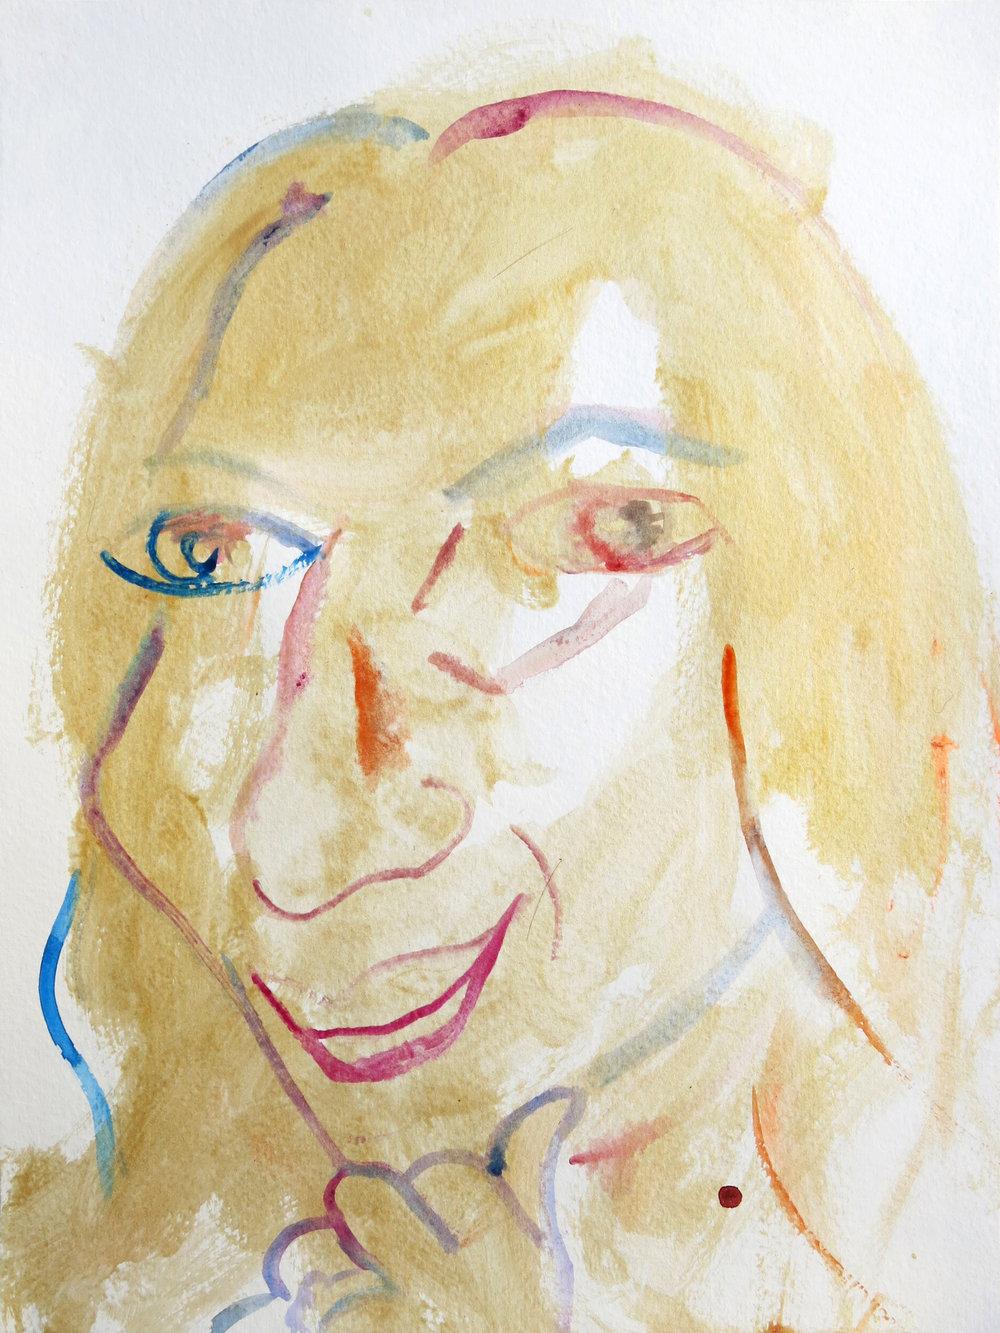 Barbra Streisand Portrait #172